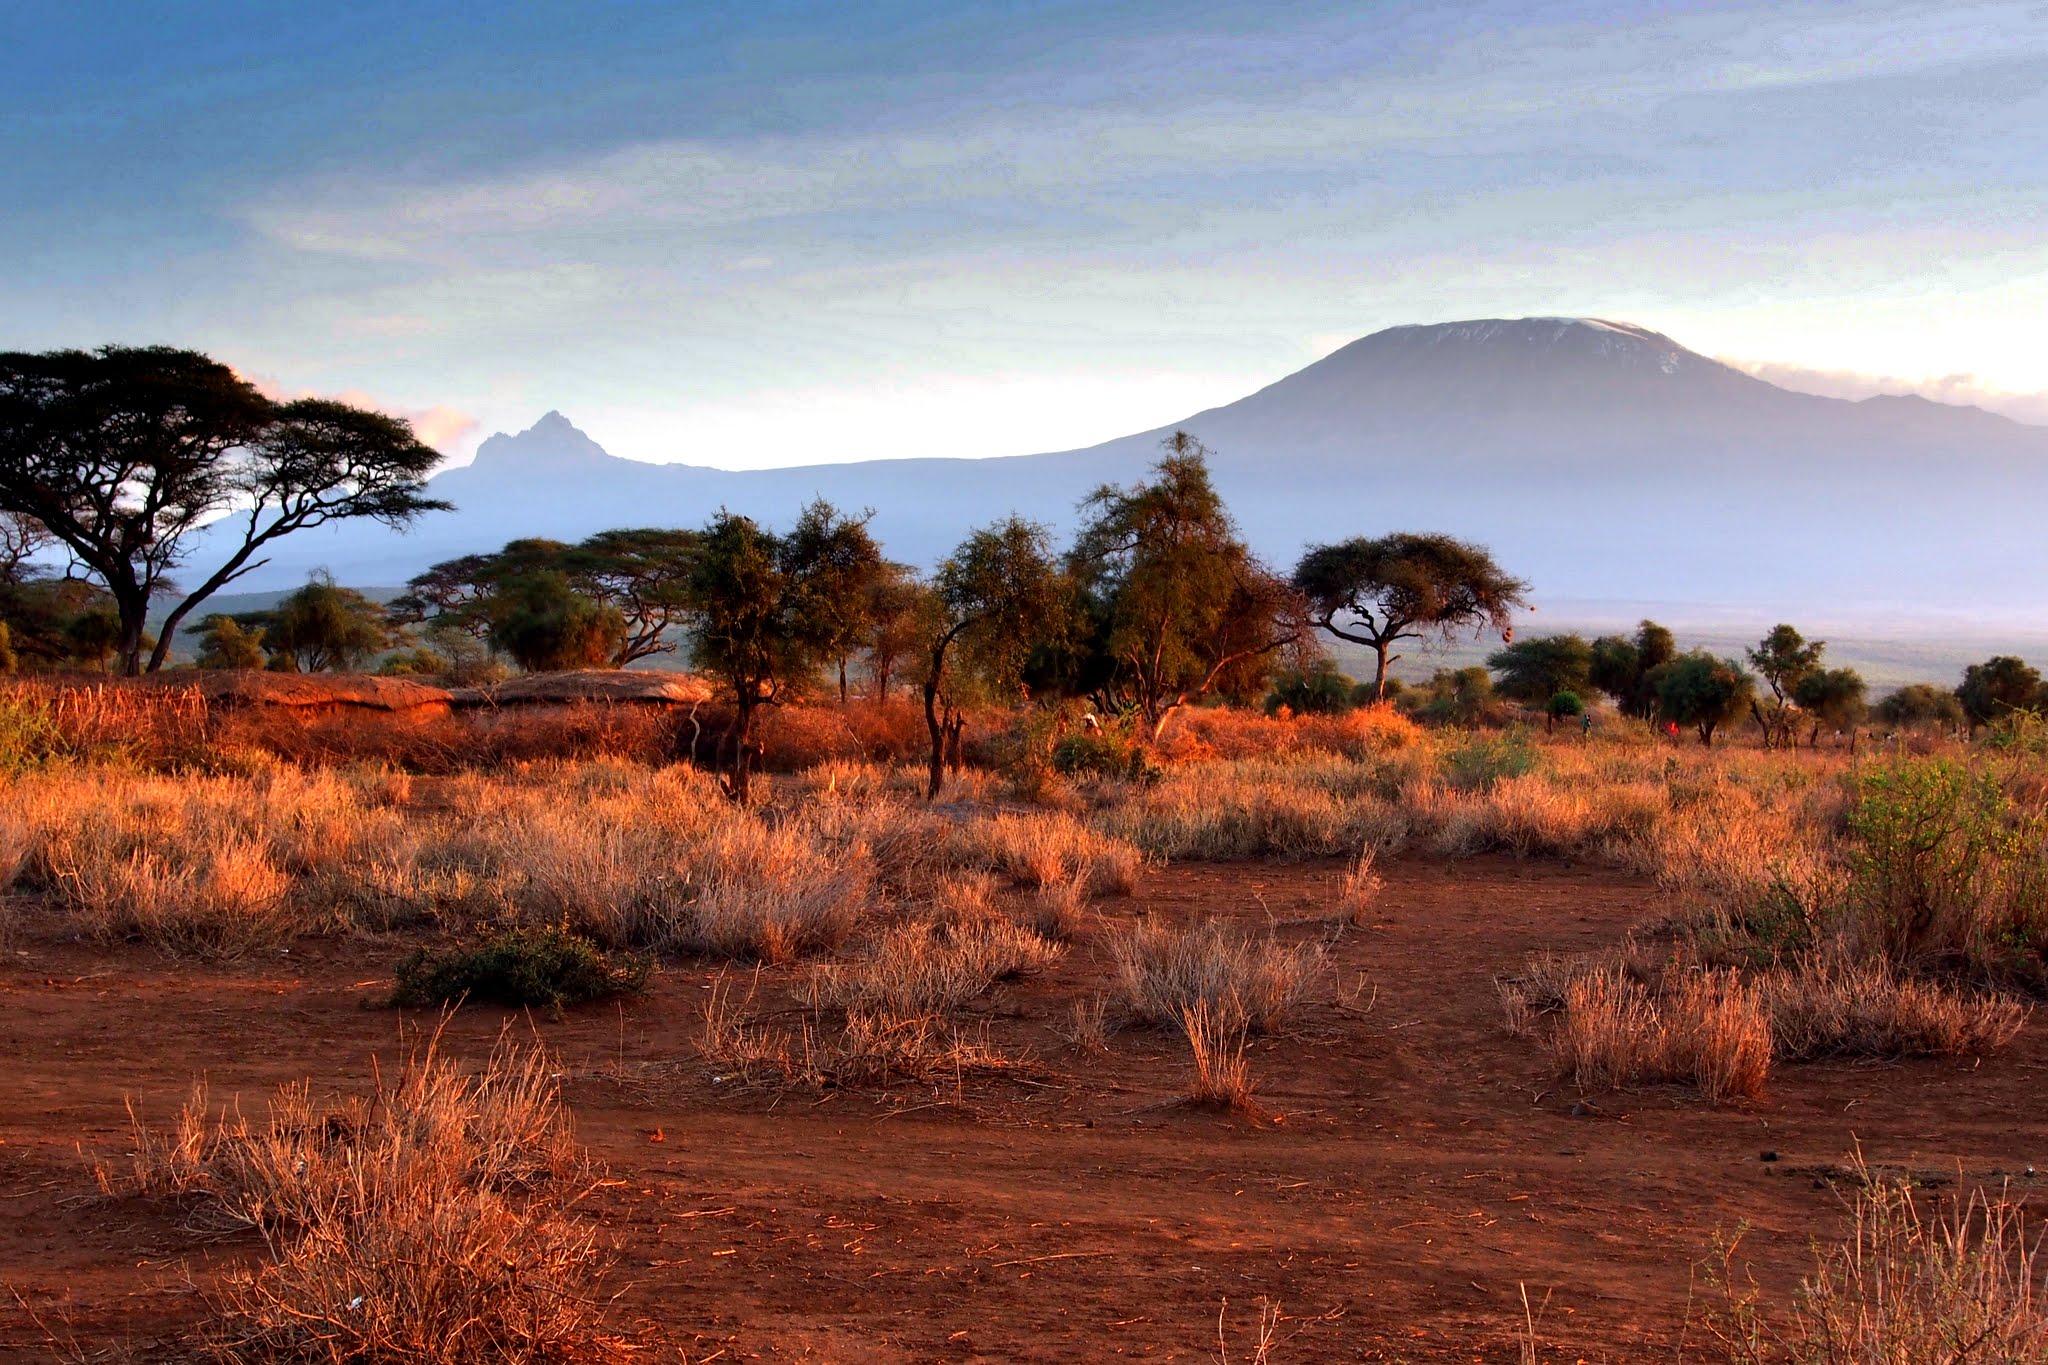 Obrázok 9. Večerná savana pod Kilimandžárom (Foto. M. Hromada)